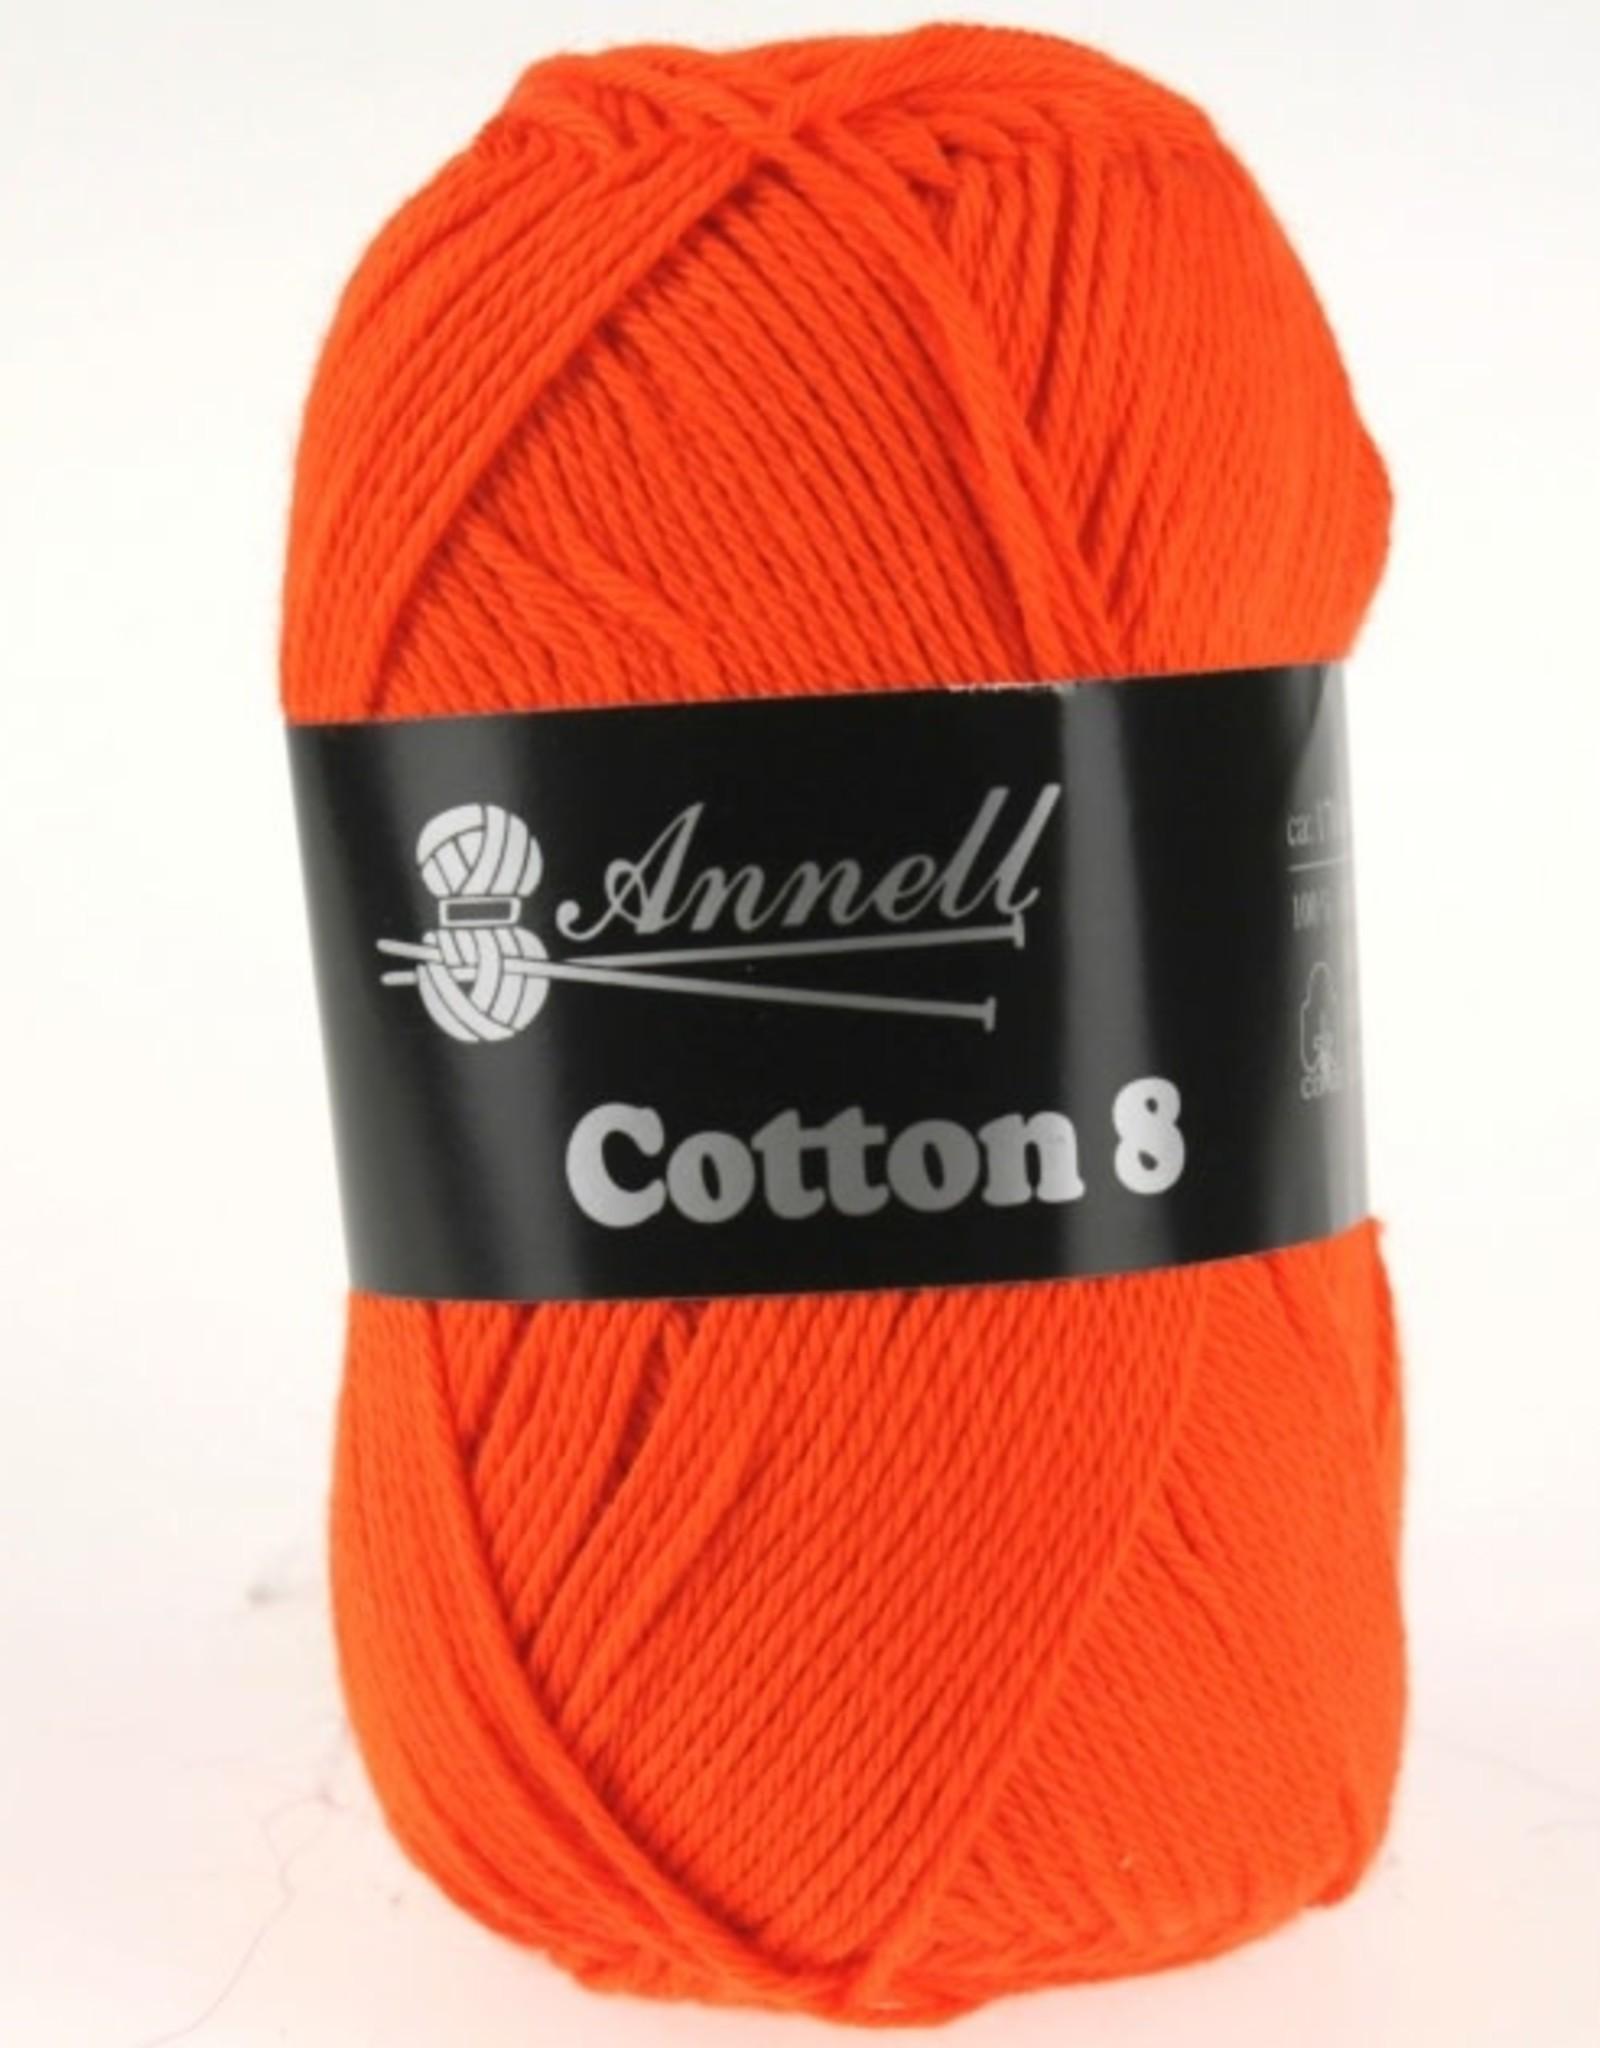 Annell Annell Cotton 8 20